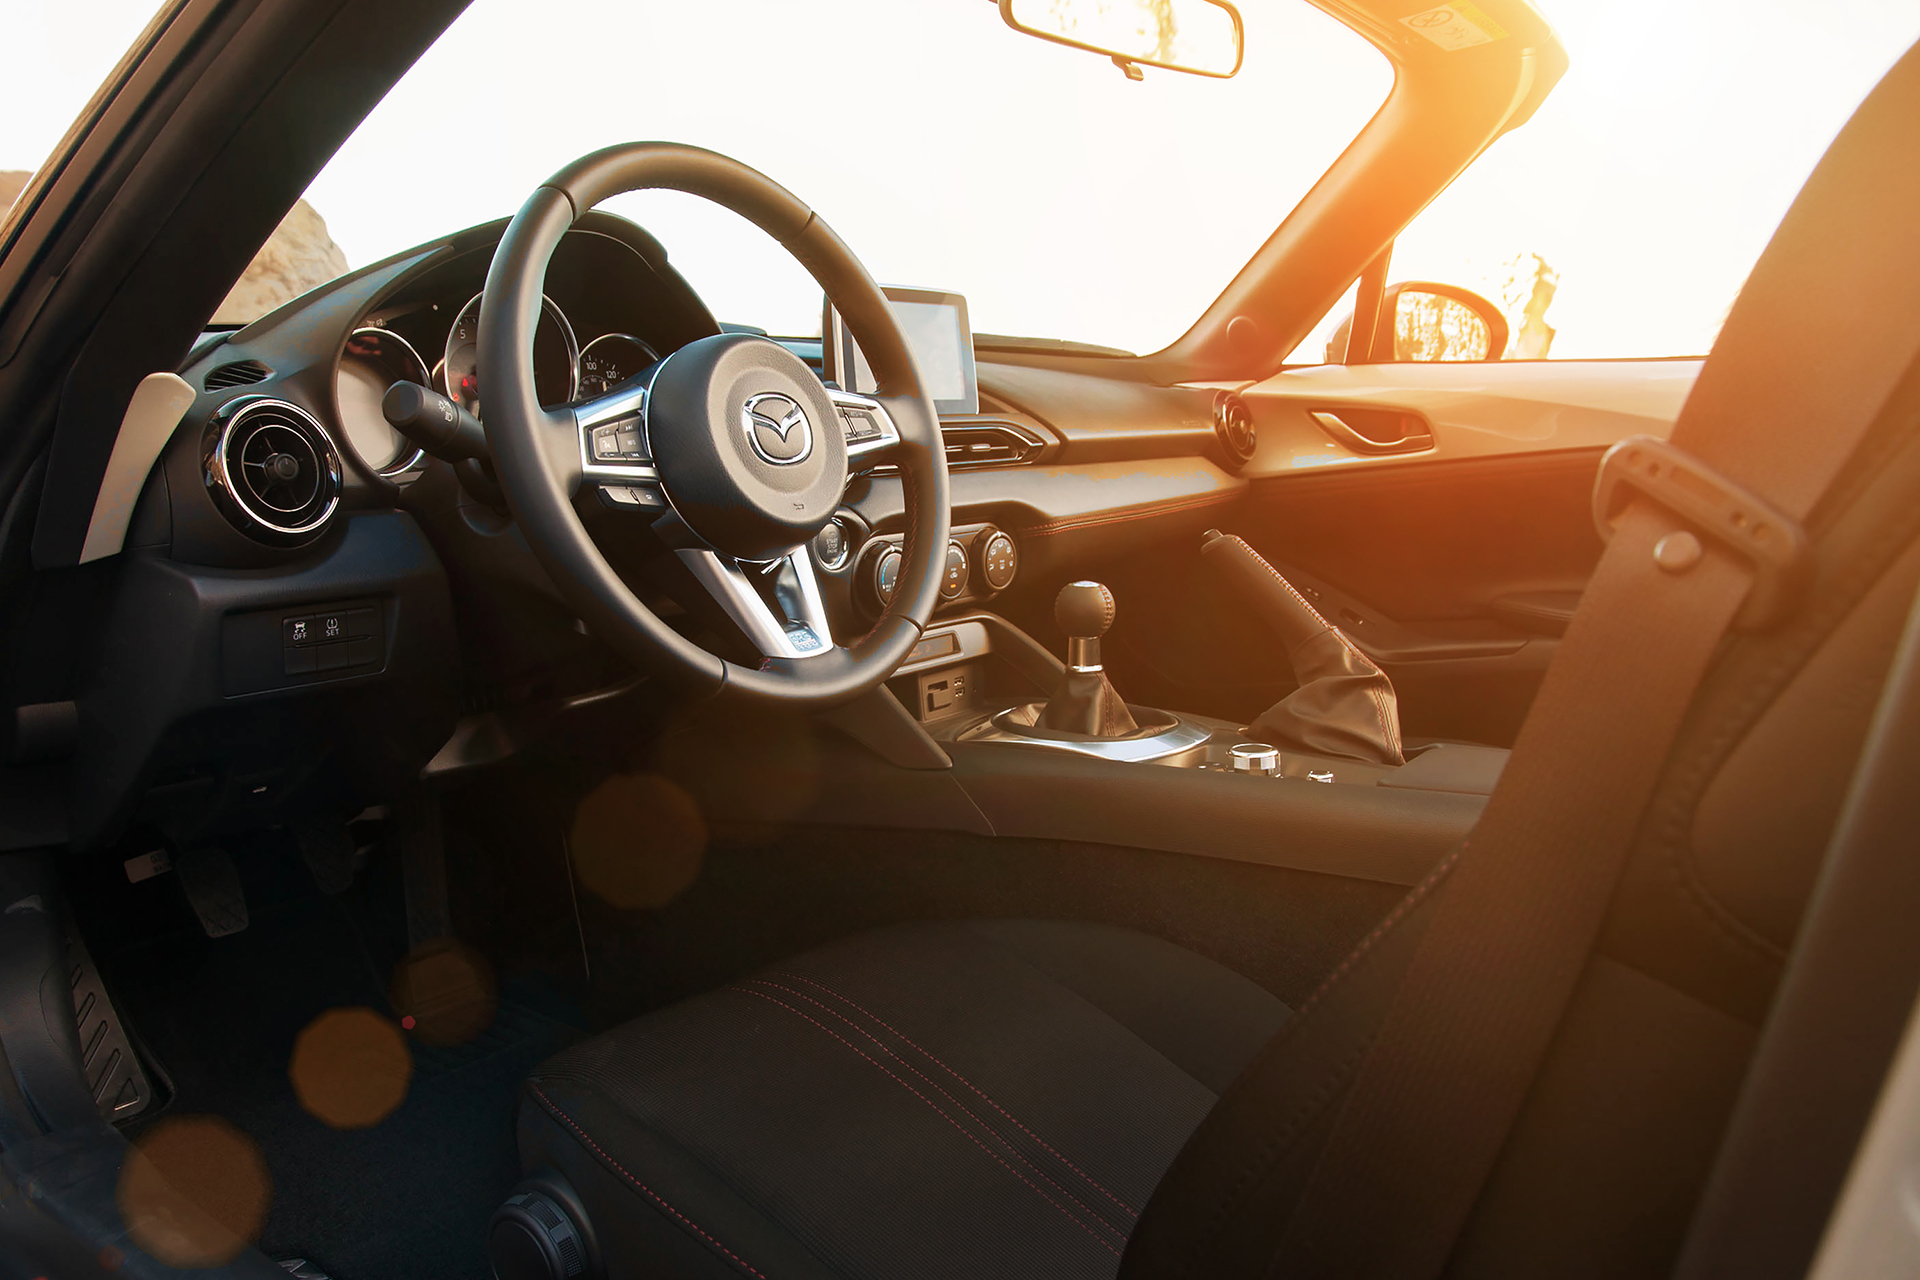 Mazda MX-5 - 2016 - intérieur / interior